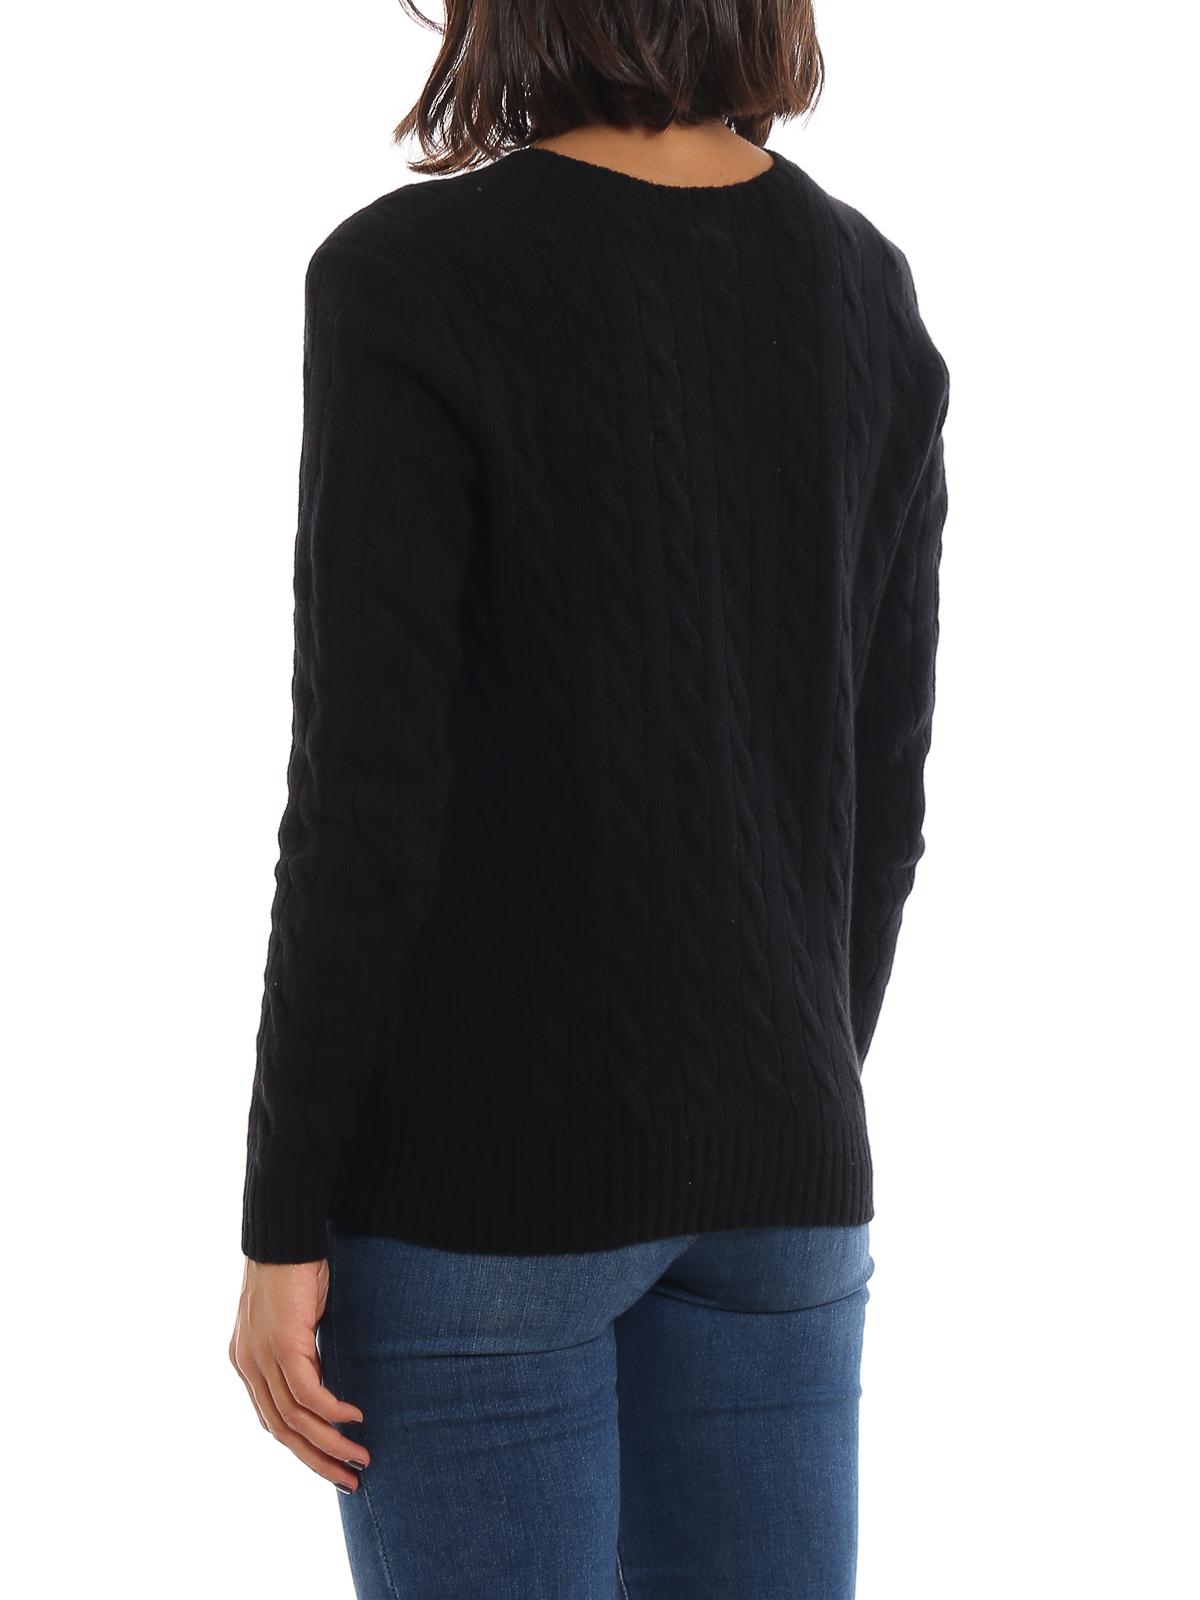 Black twist knit cotton sweater POLO RALPH LAUREN | -108764232 | 211525764002